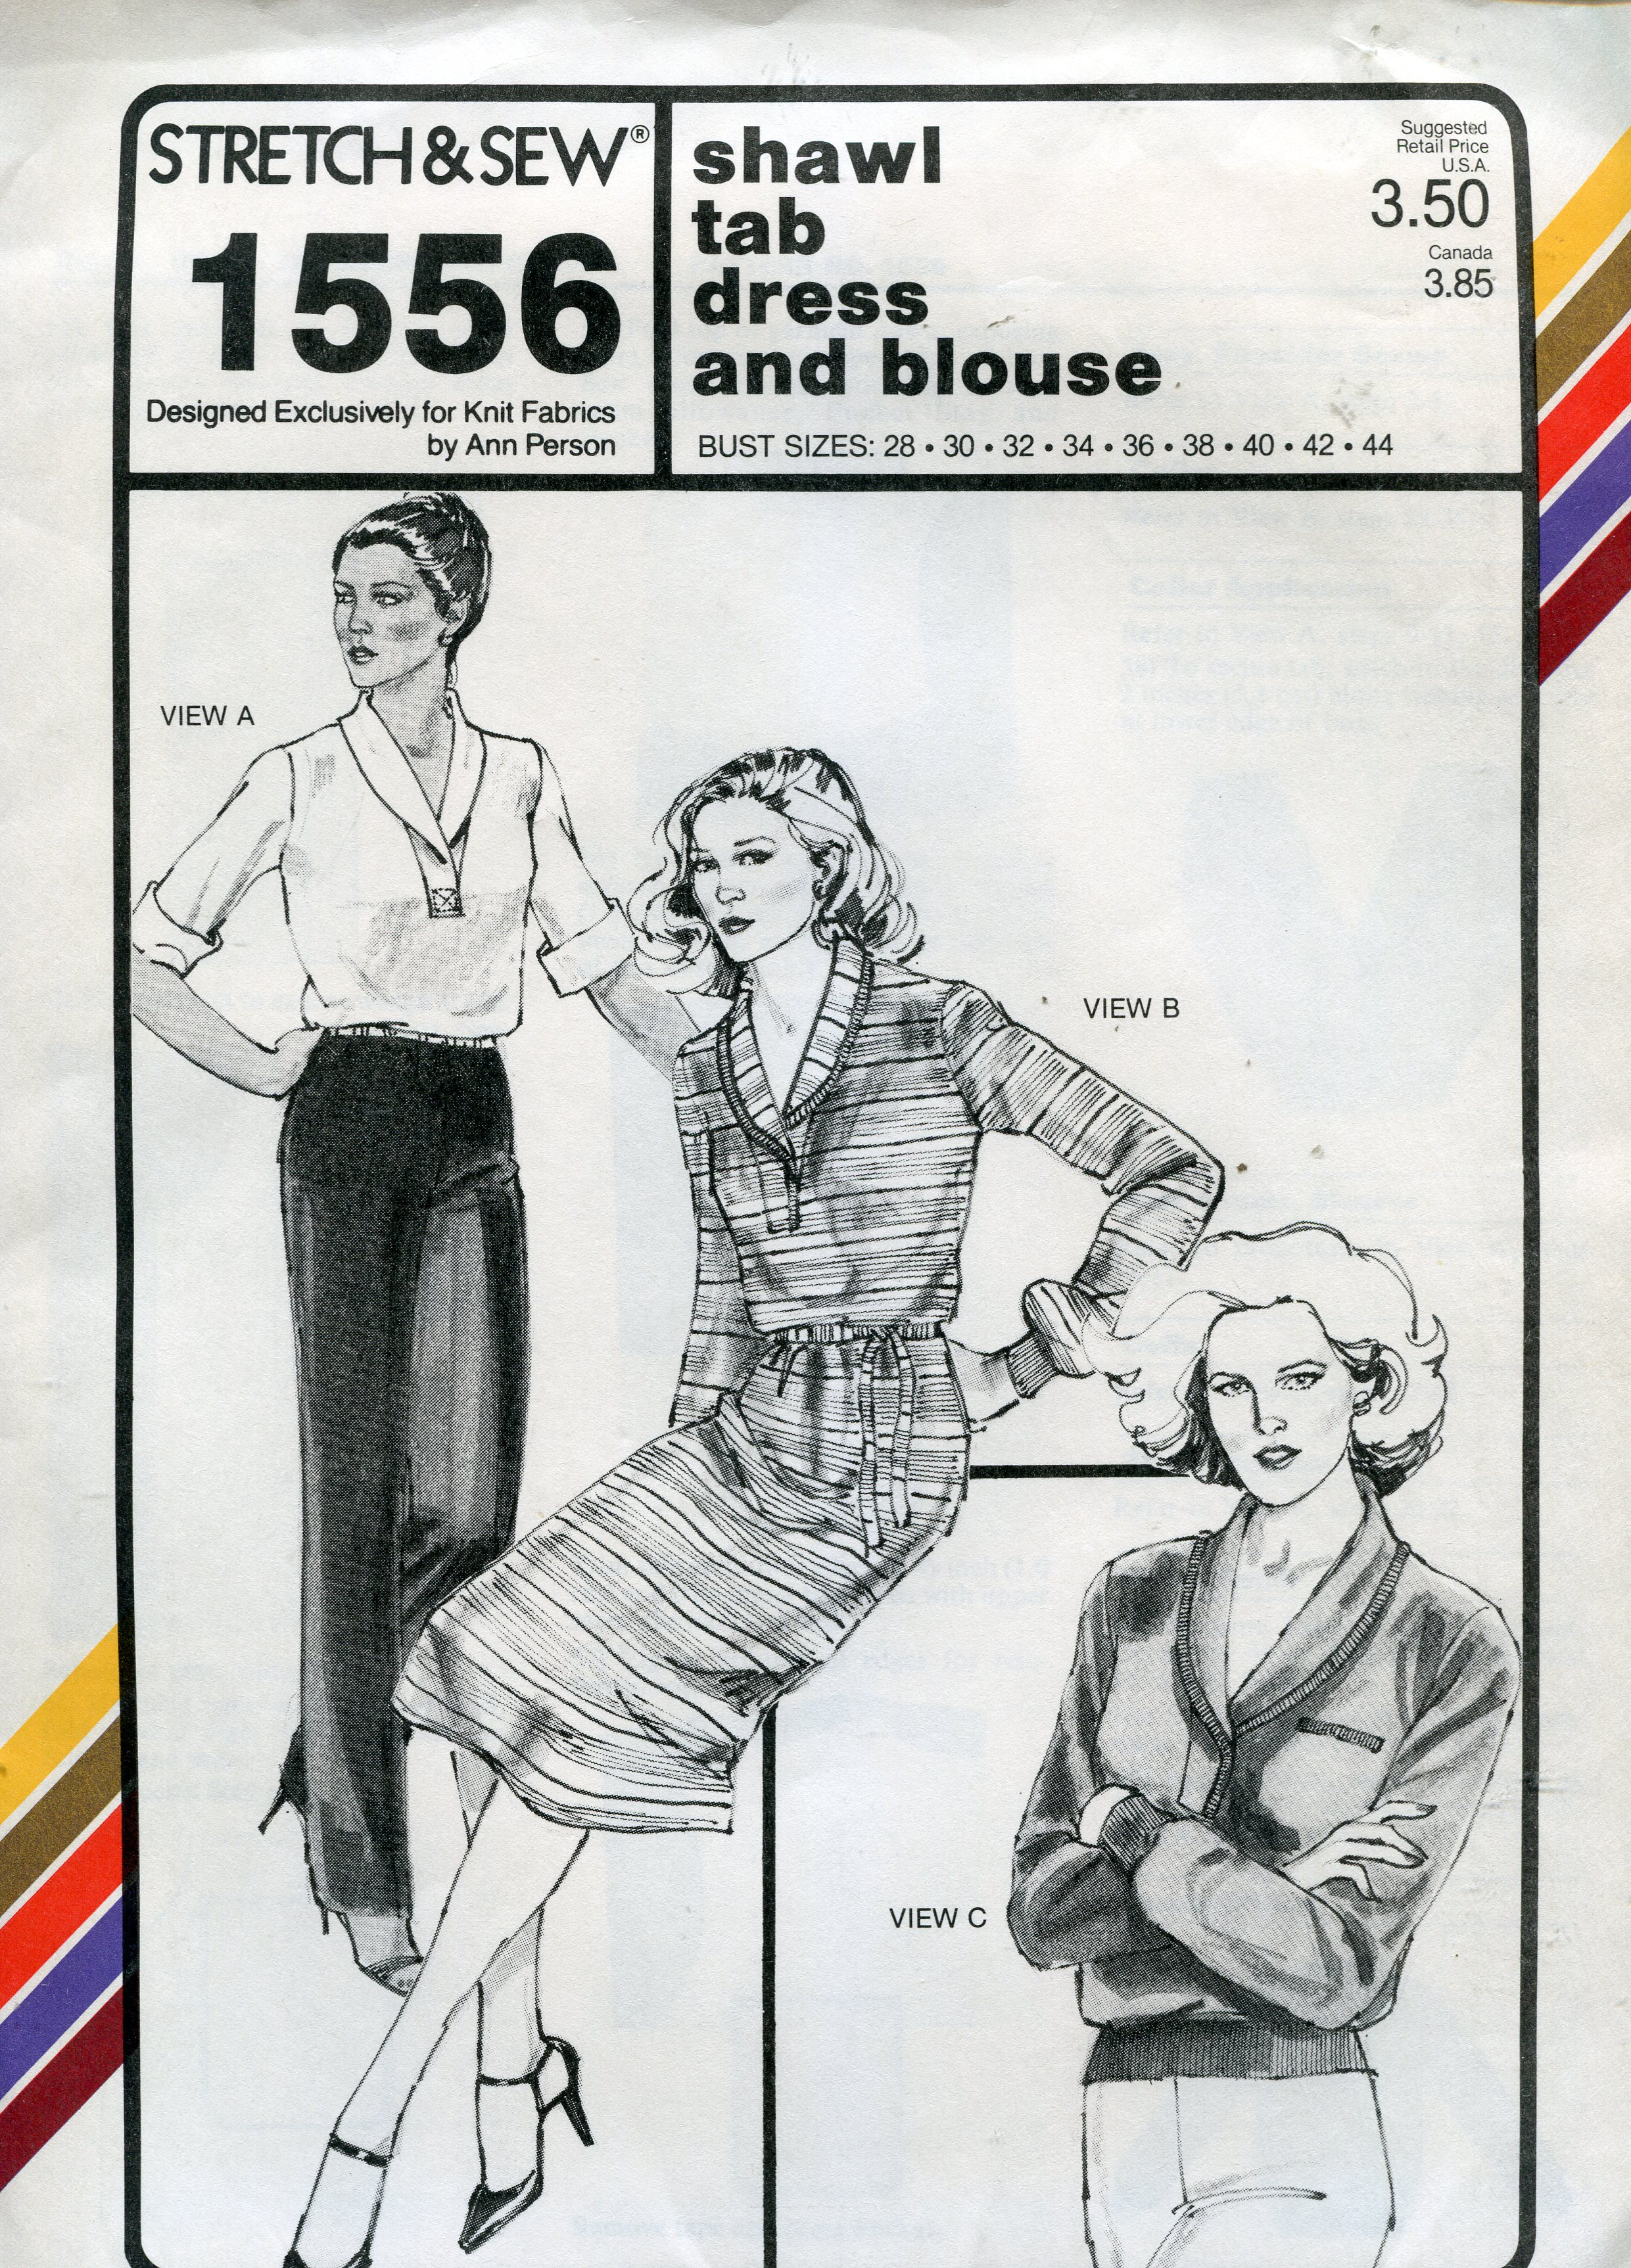 Stretch & Sew 1556